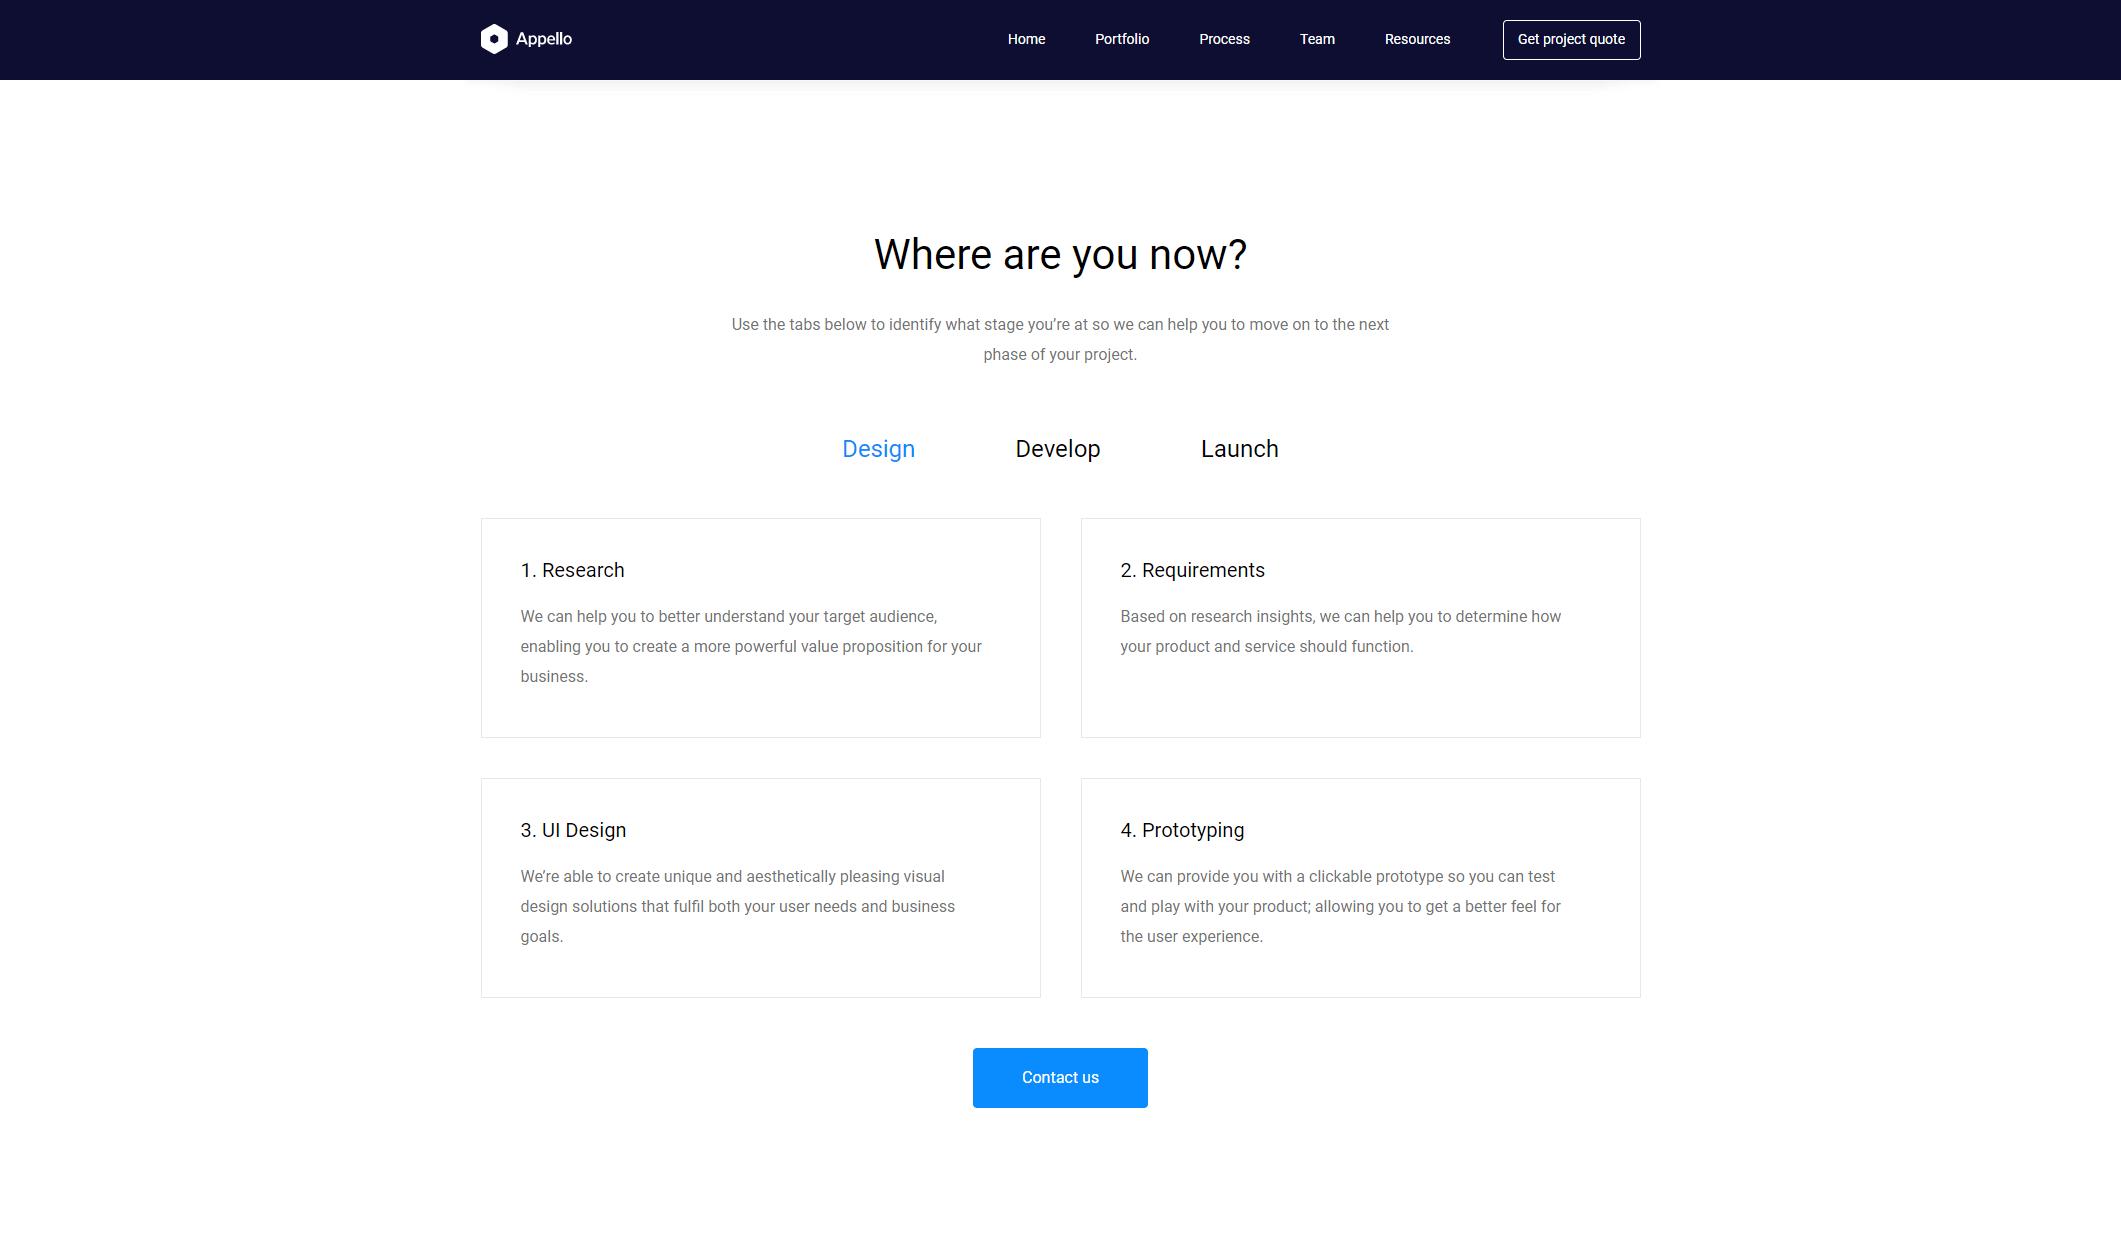 appello.com.au-2